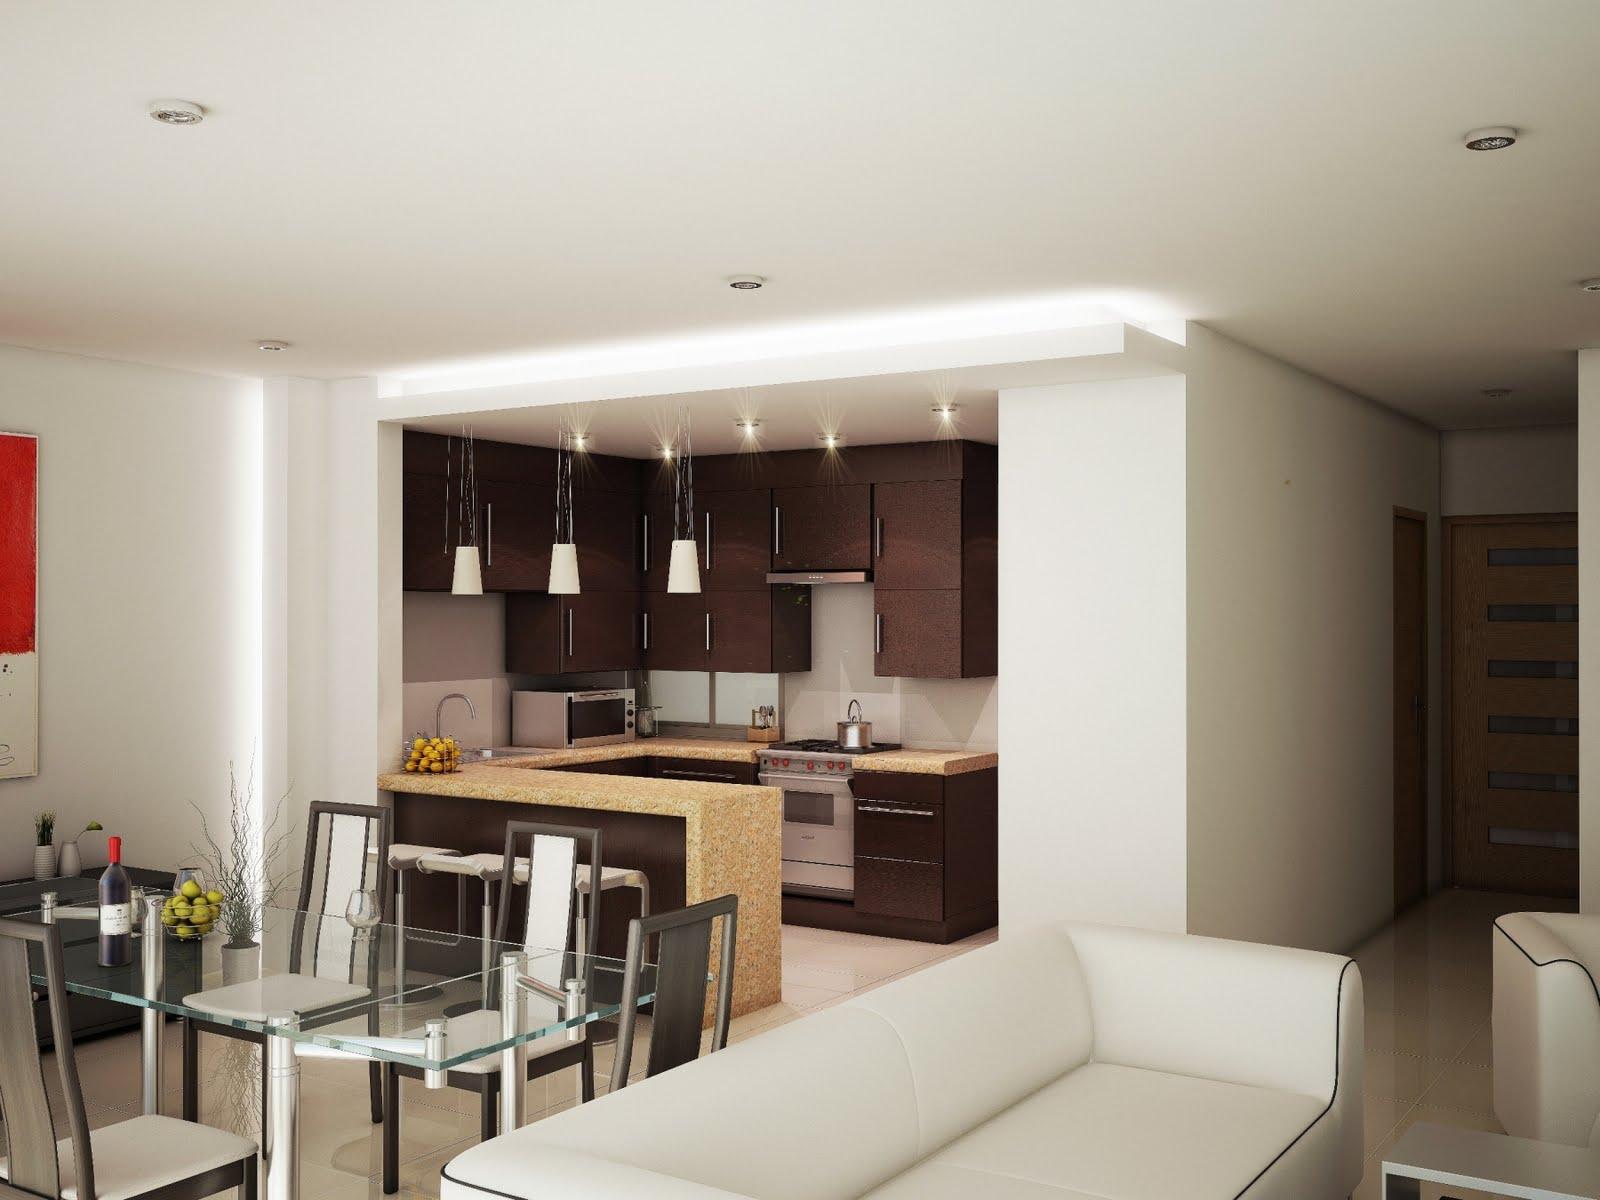 3d render animacion e infografia departamentos en veracruz for Interiores de departamentos